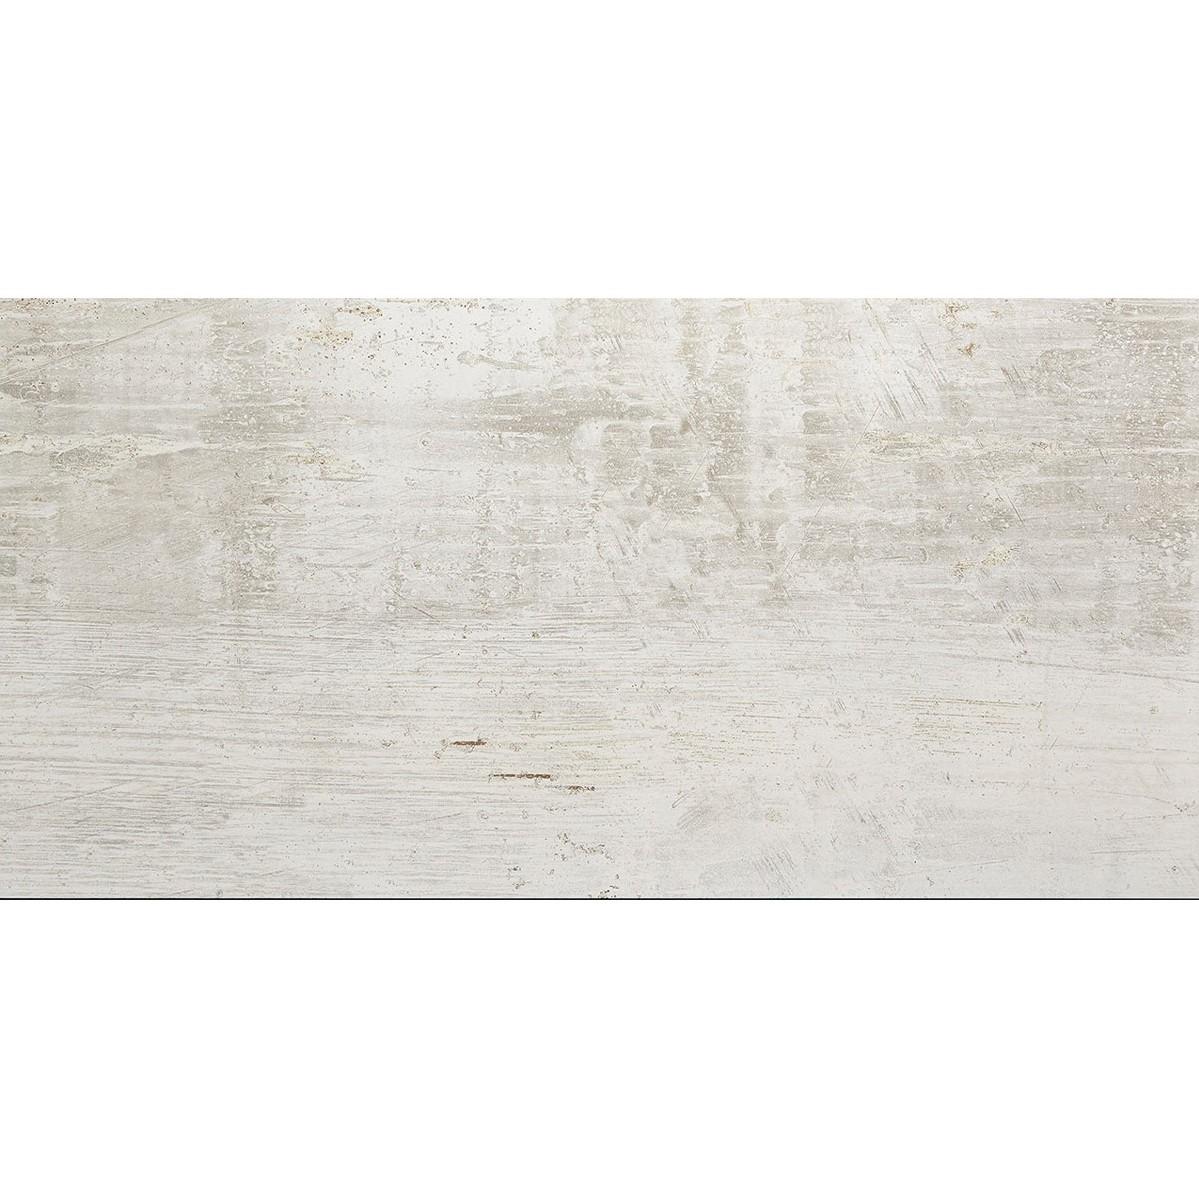 CAST IRON WHITE NATURAL 760 WEB 1